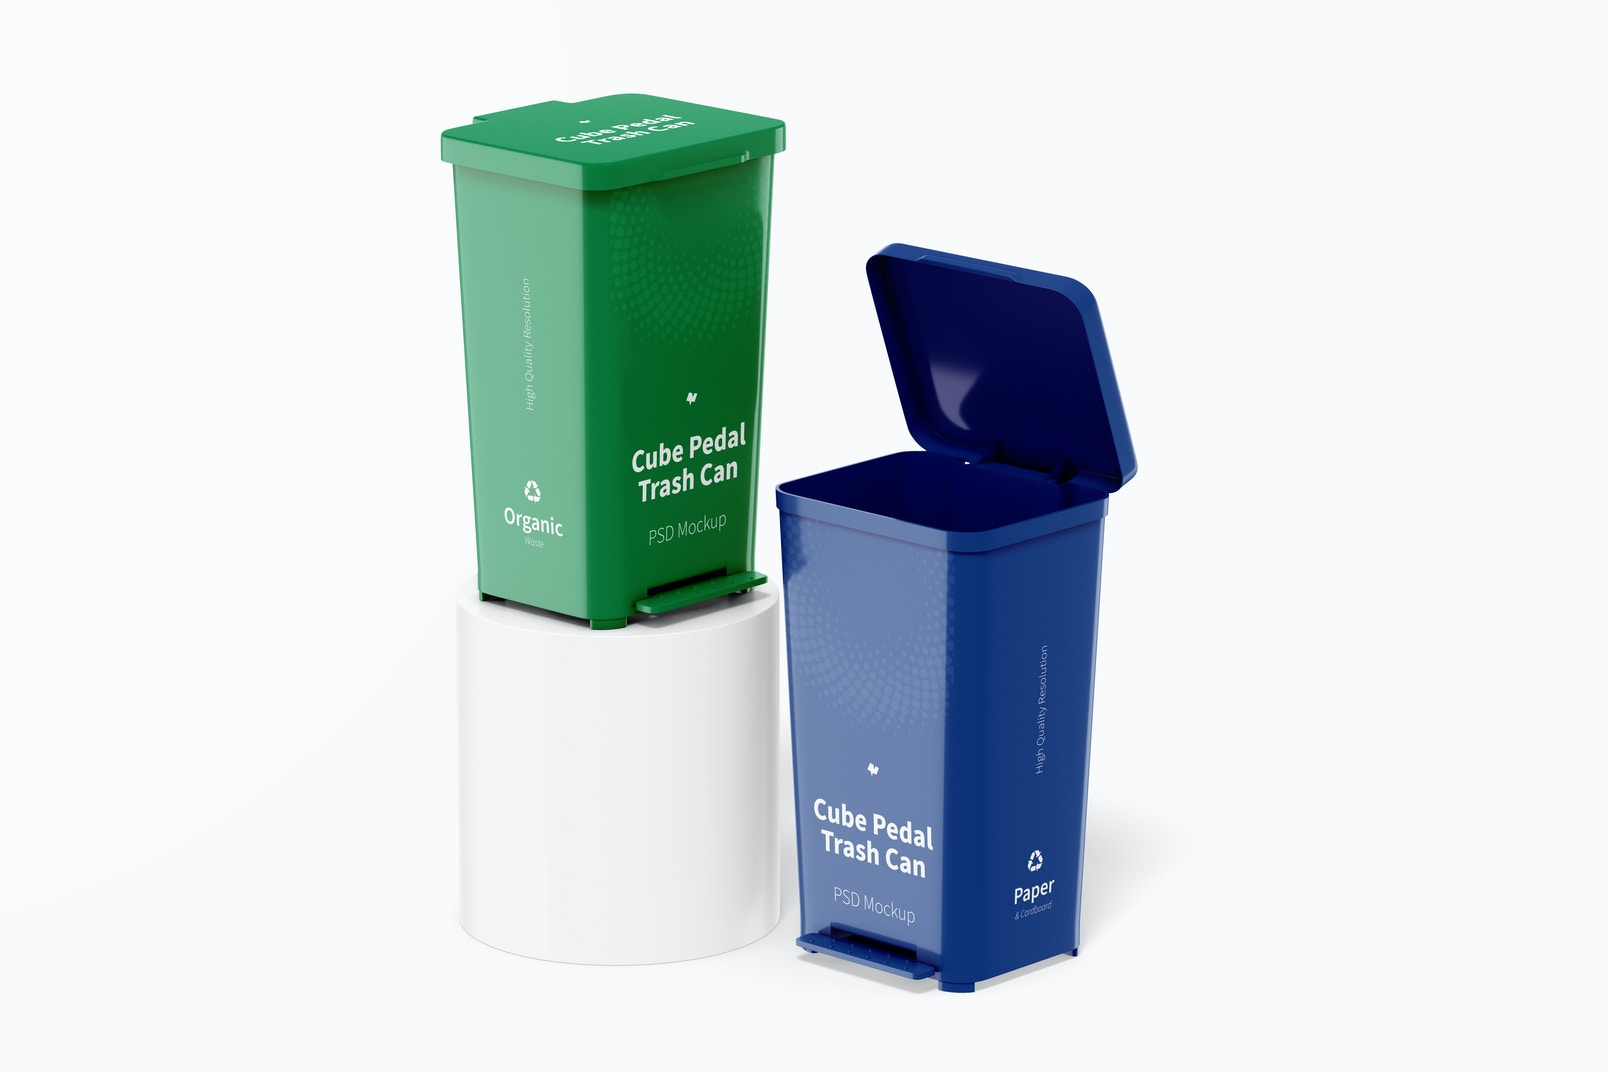 Cube Pedal Trash Cans Mockup